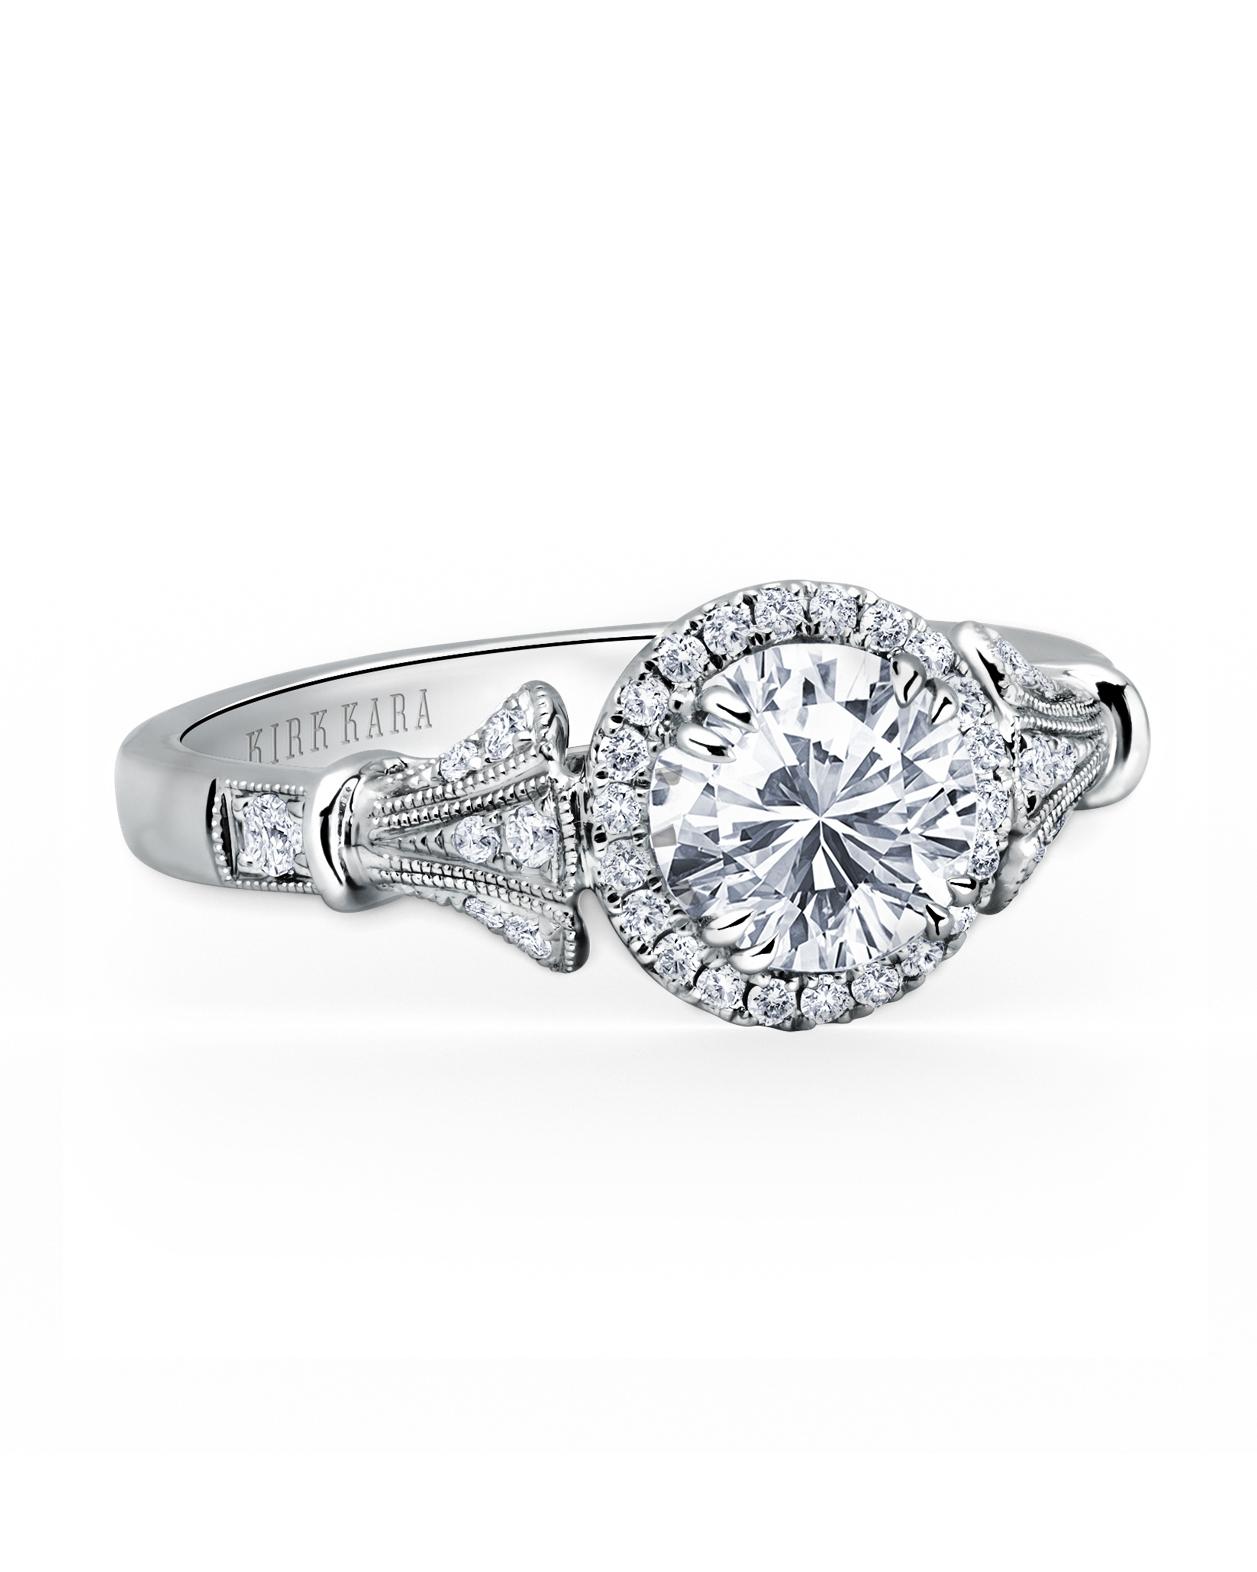 kirk-kara-white-gold-round-engagement-ring-three-0816.jpg